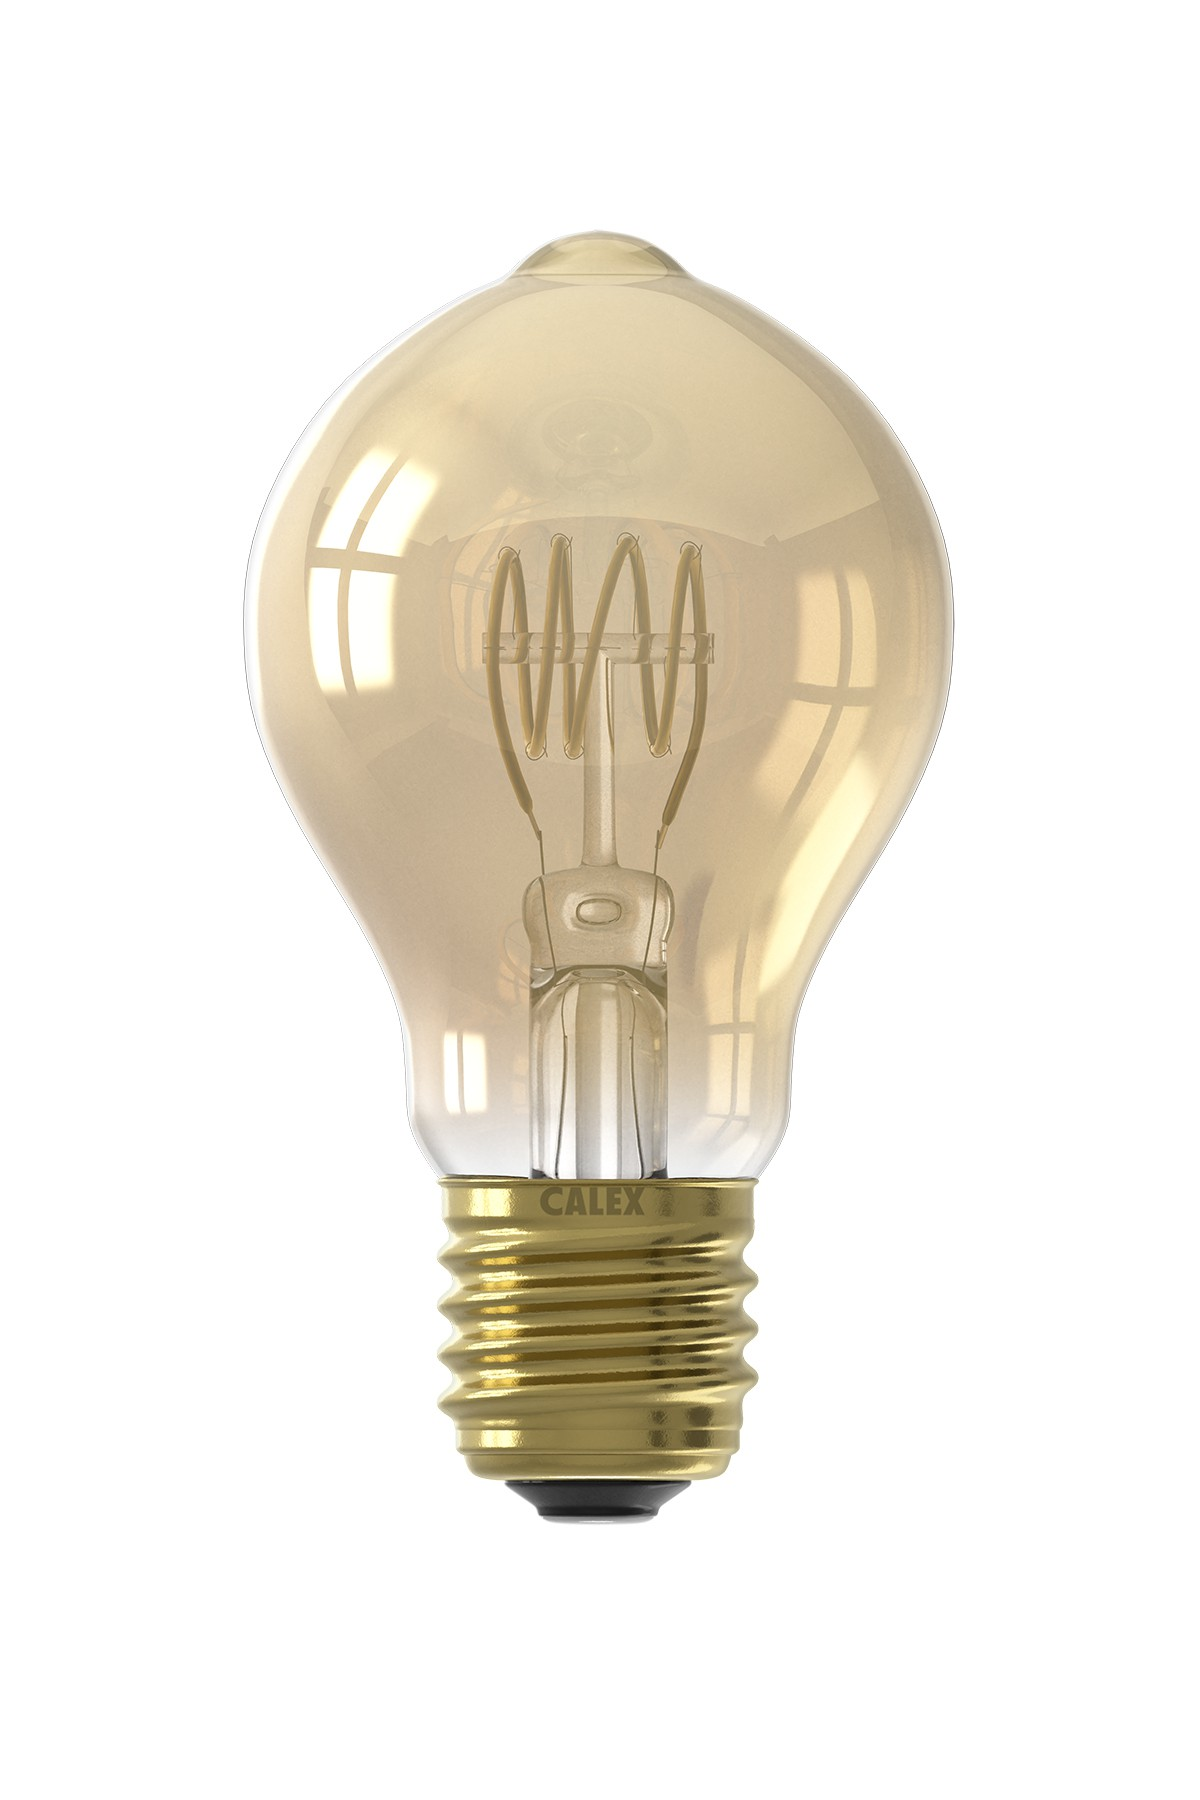 Calex LED volglas Flex Filament Standaardlamp 240V 4W 200lm E27 A60DR, Goud 2100K Dimbaar